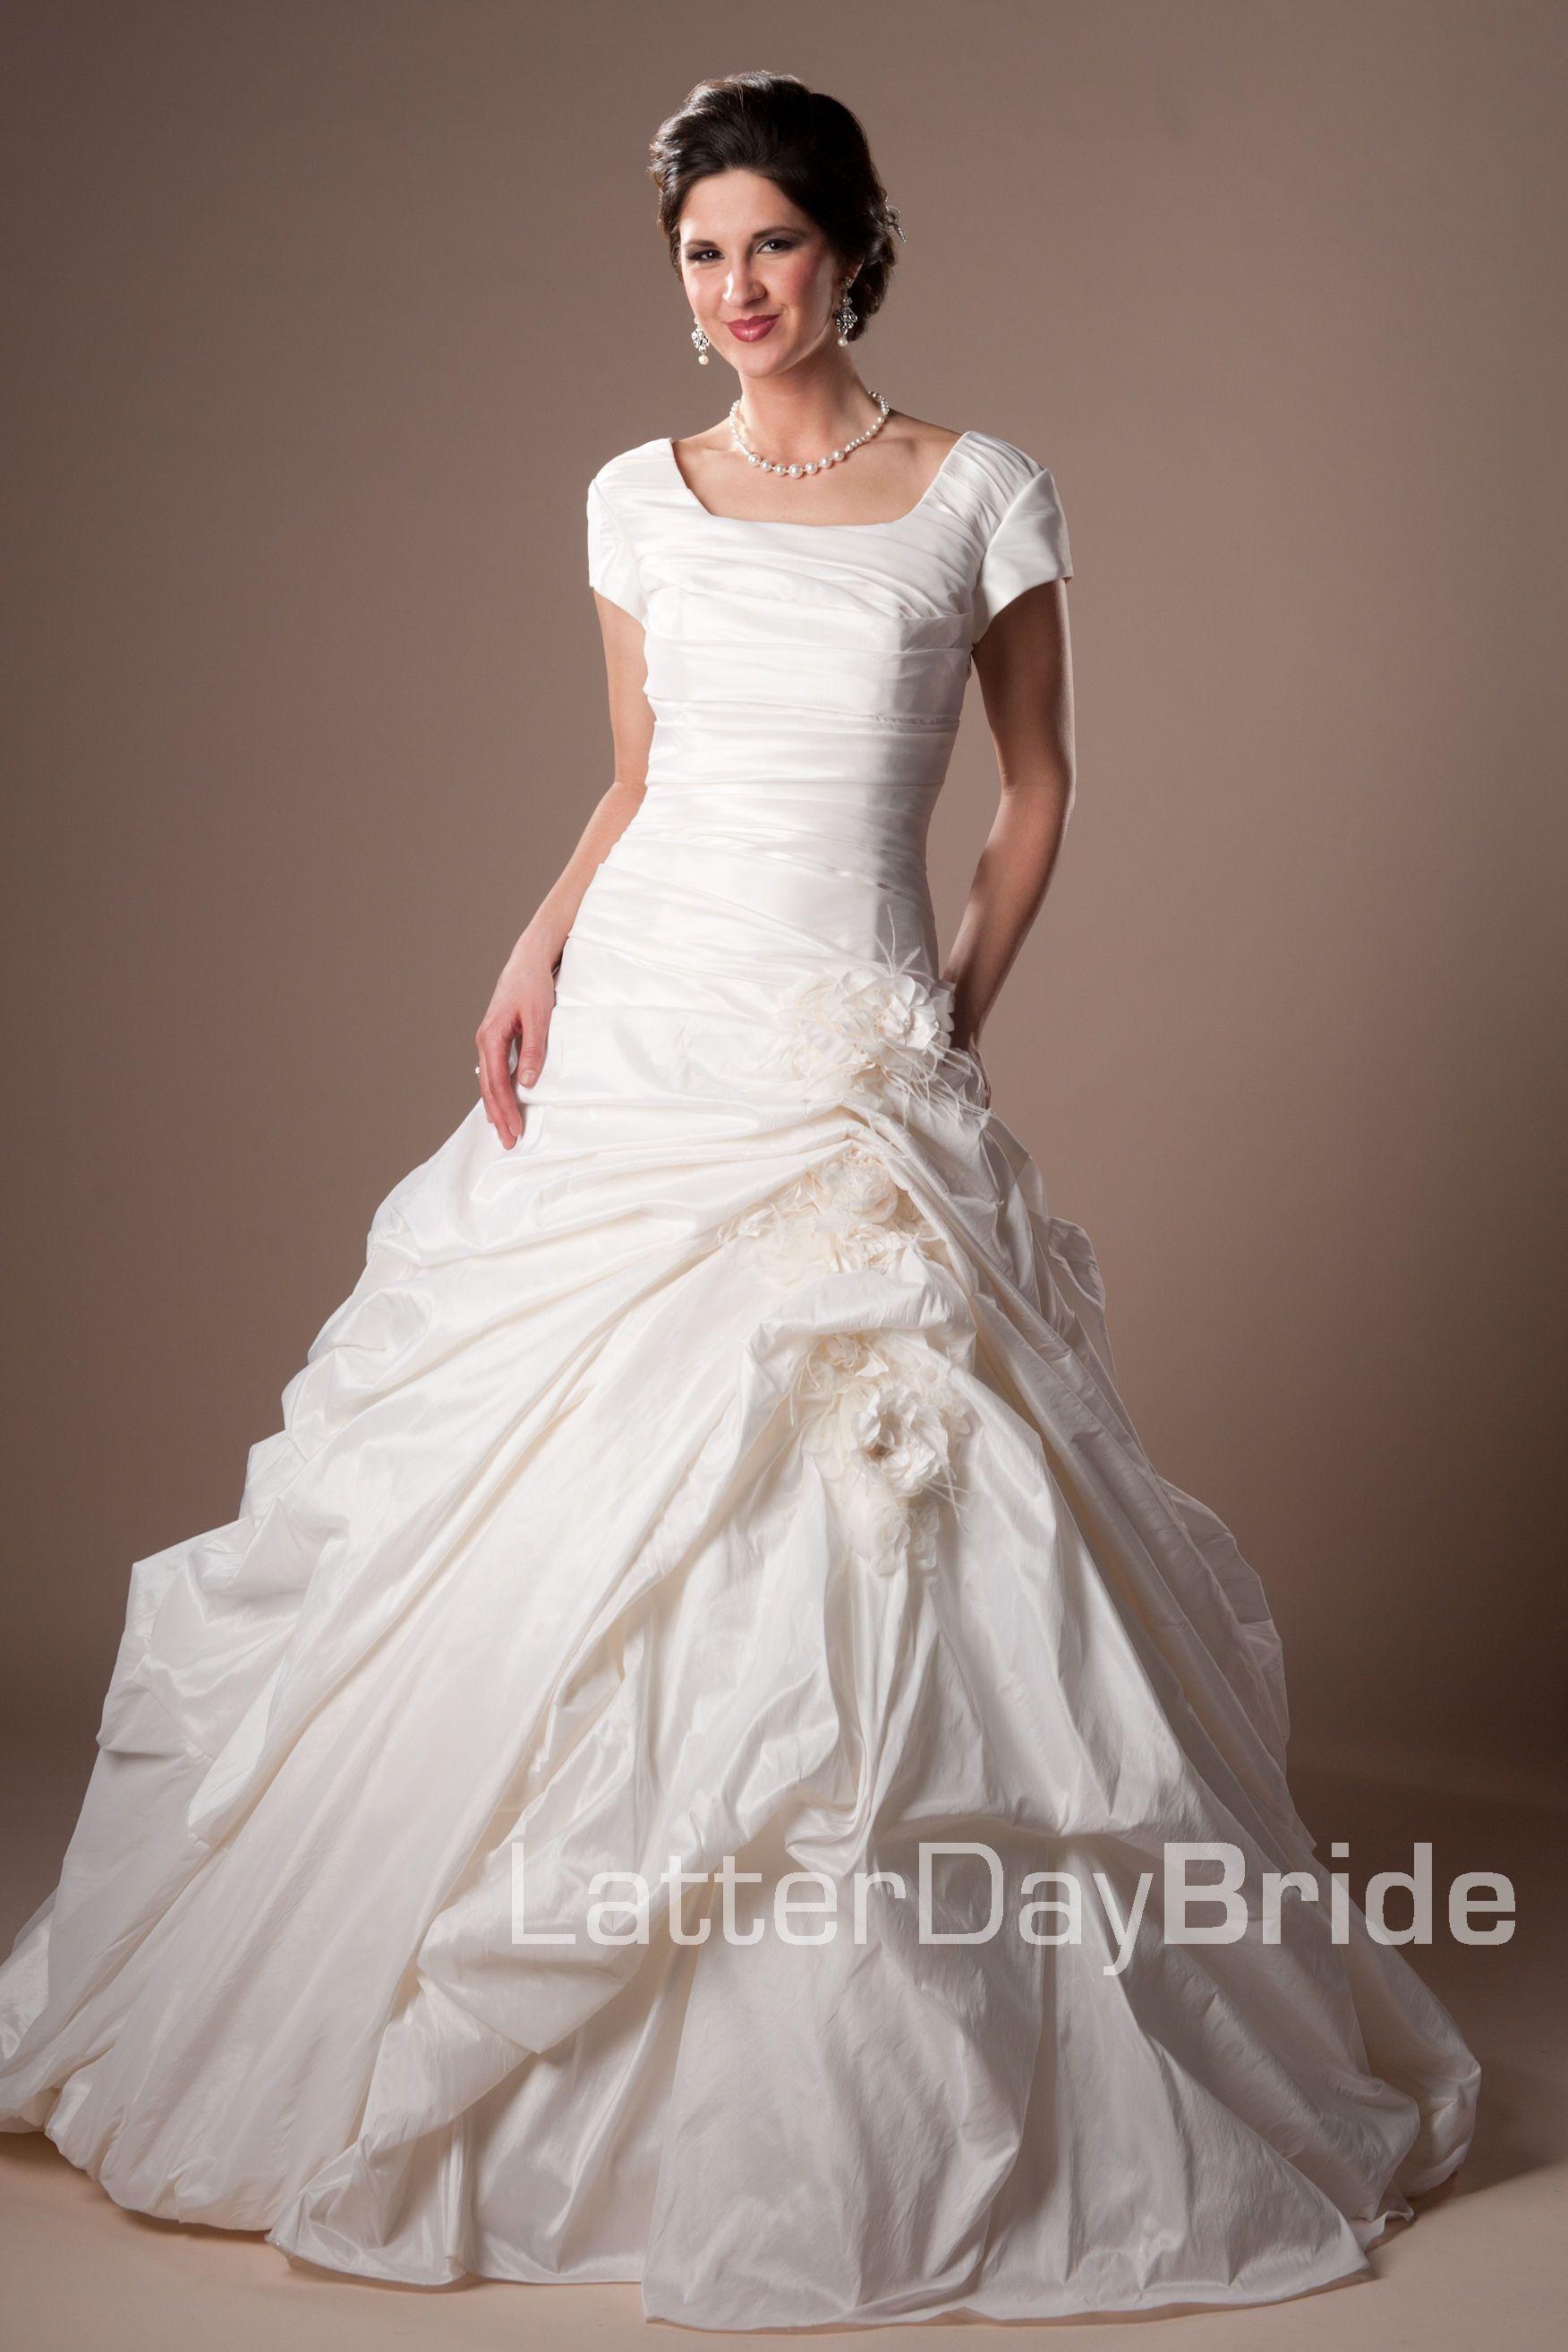 Modest Wedding Dress, Helene | LatterDayBride & Prom. Modest Mormon ...